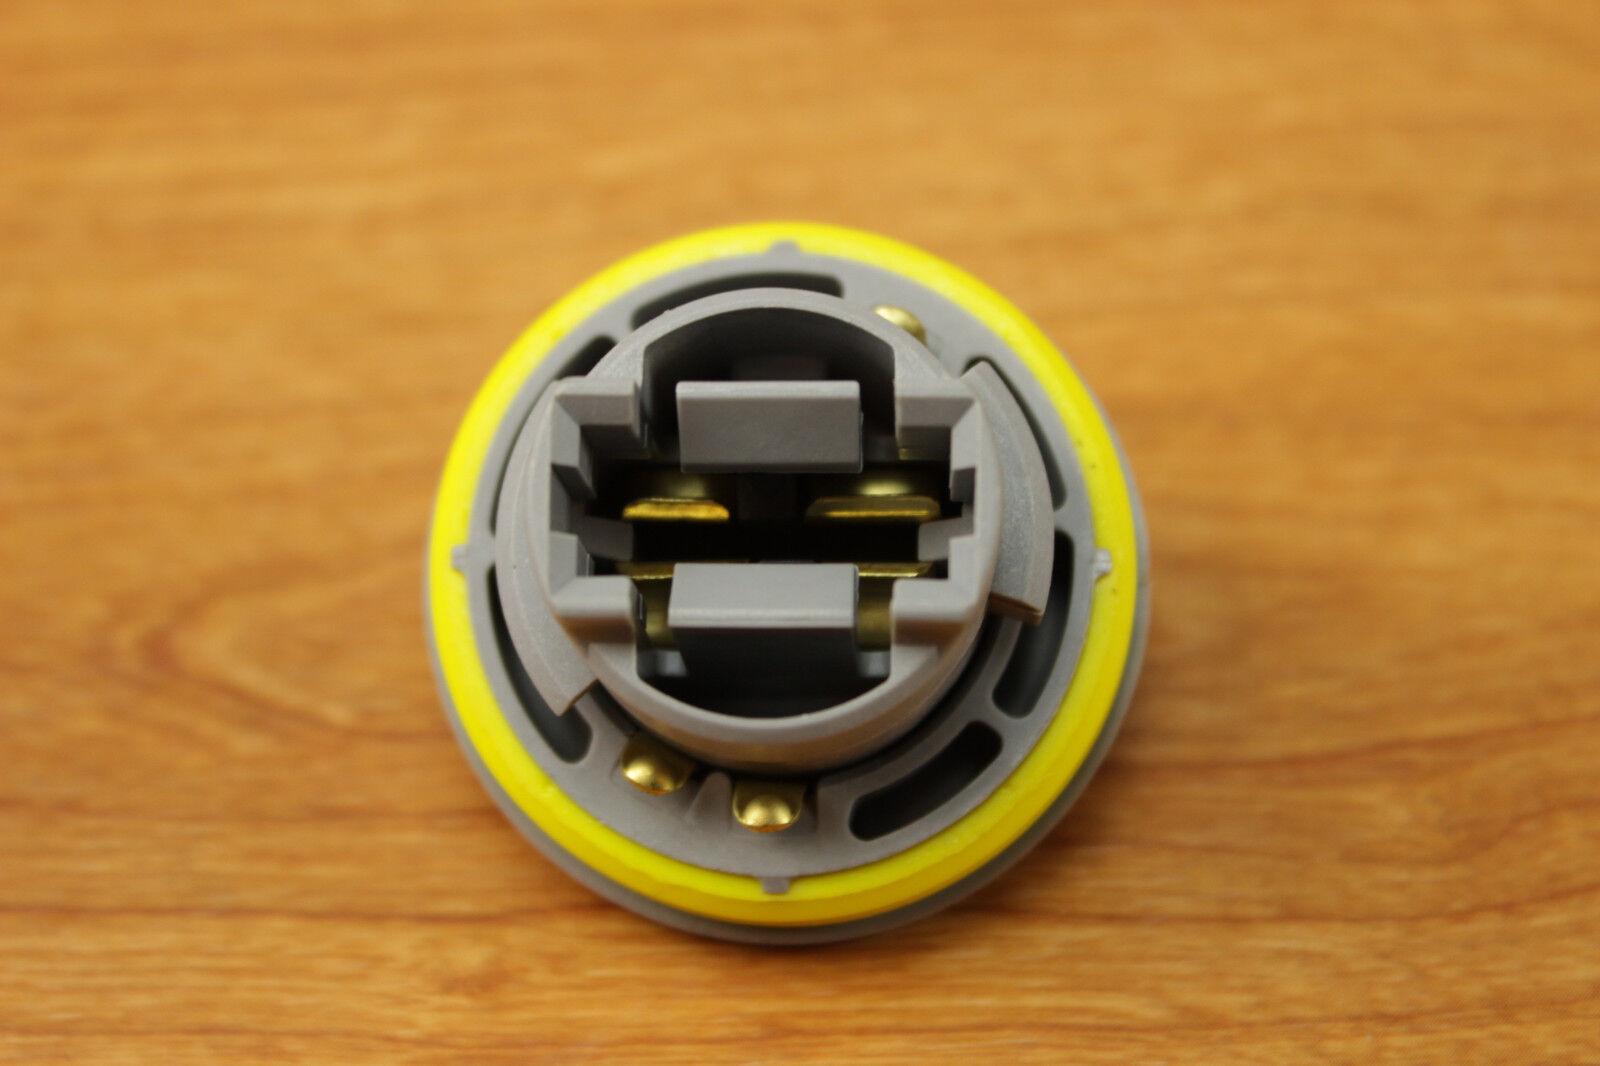 2002-07 JEEP LIBERTY Rear Lamp Socket OEM# 4676589